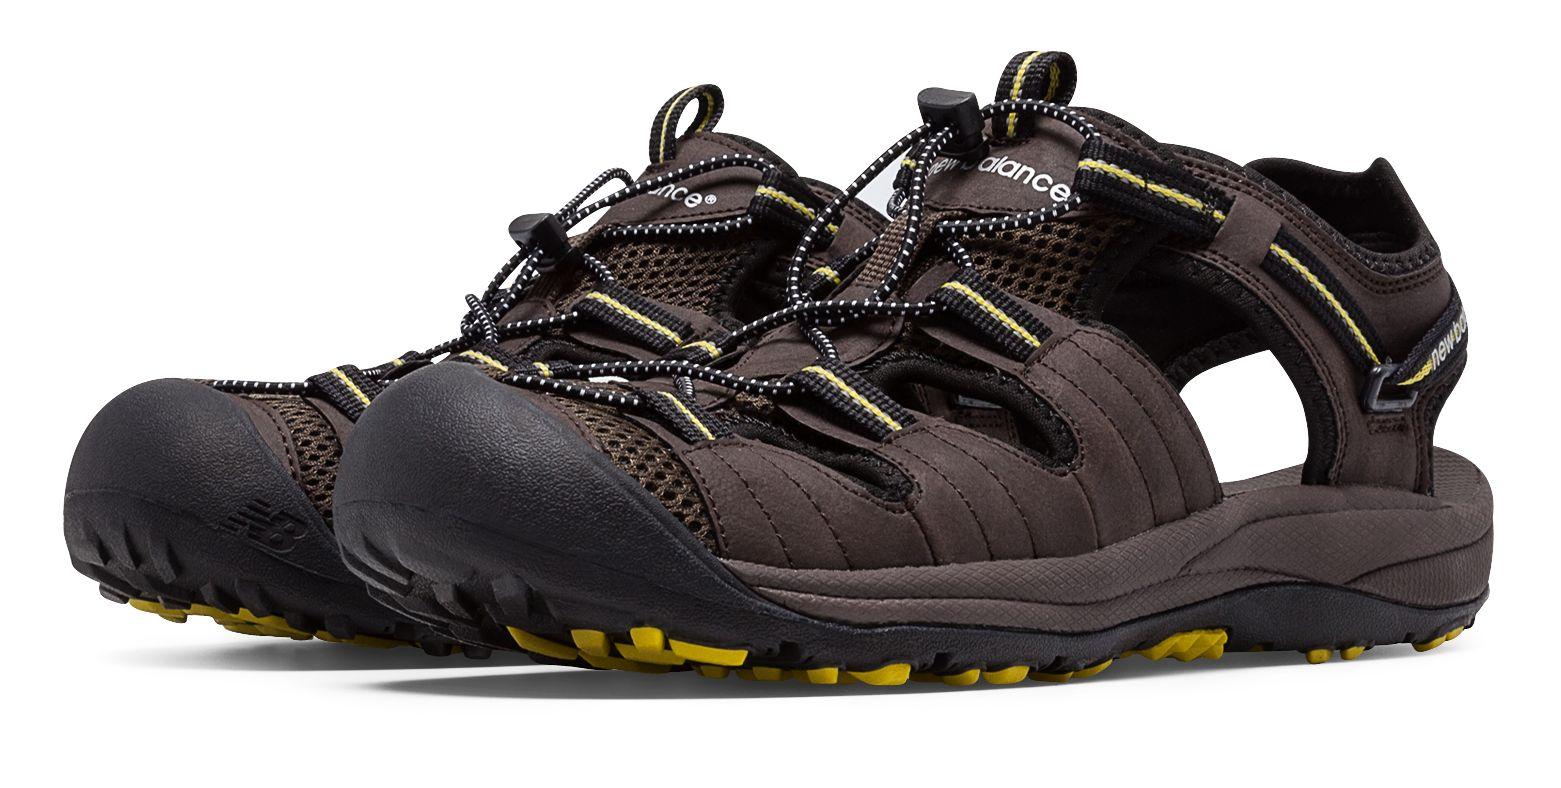 87d1bacf30c5 ... UPC 848851093723 product image for New Balance Men s Appalachian Sandal  Shoes Brown